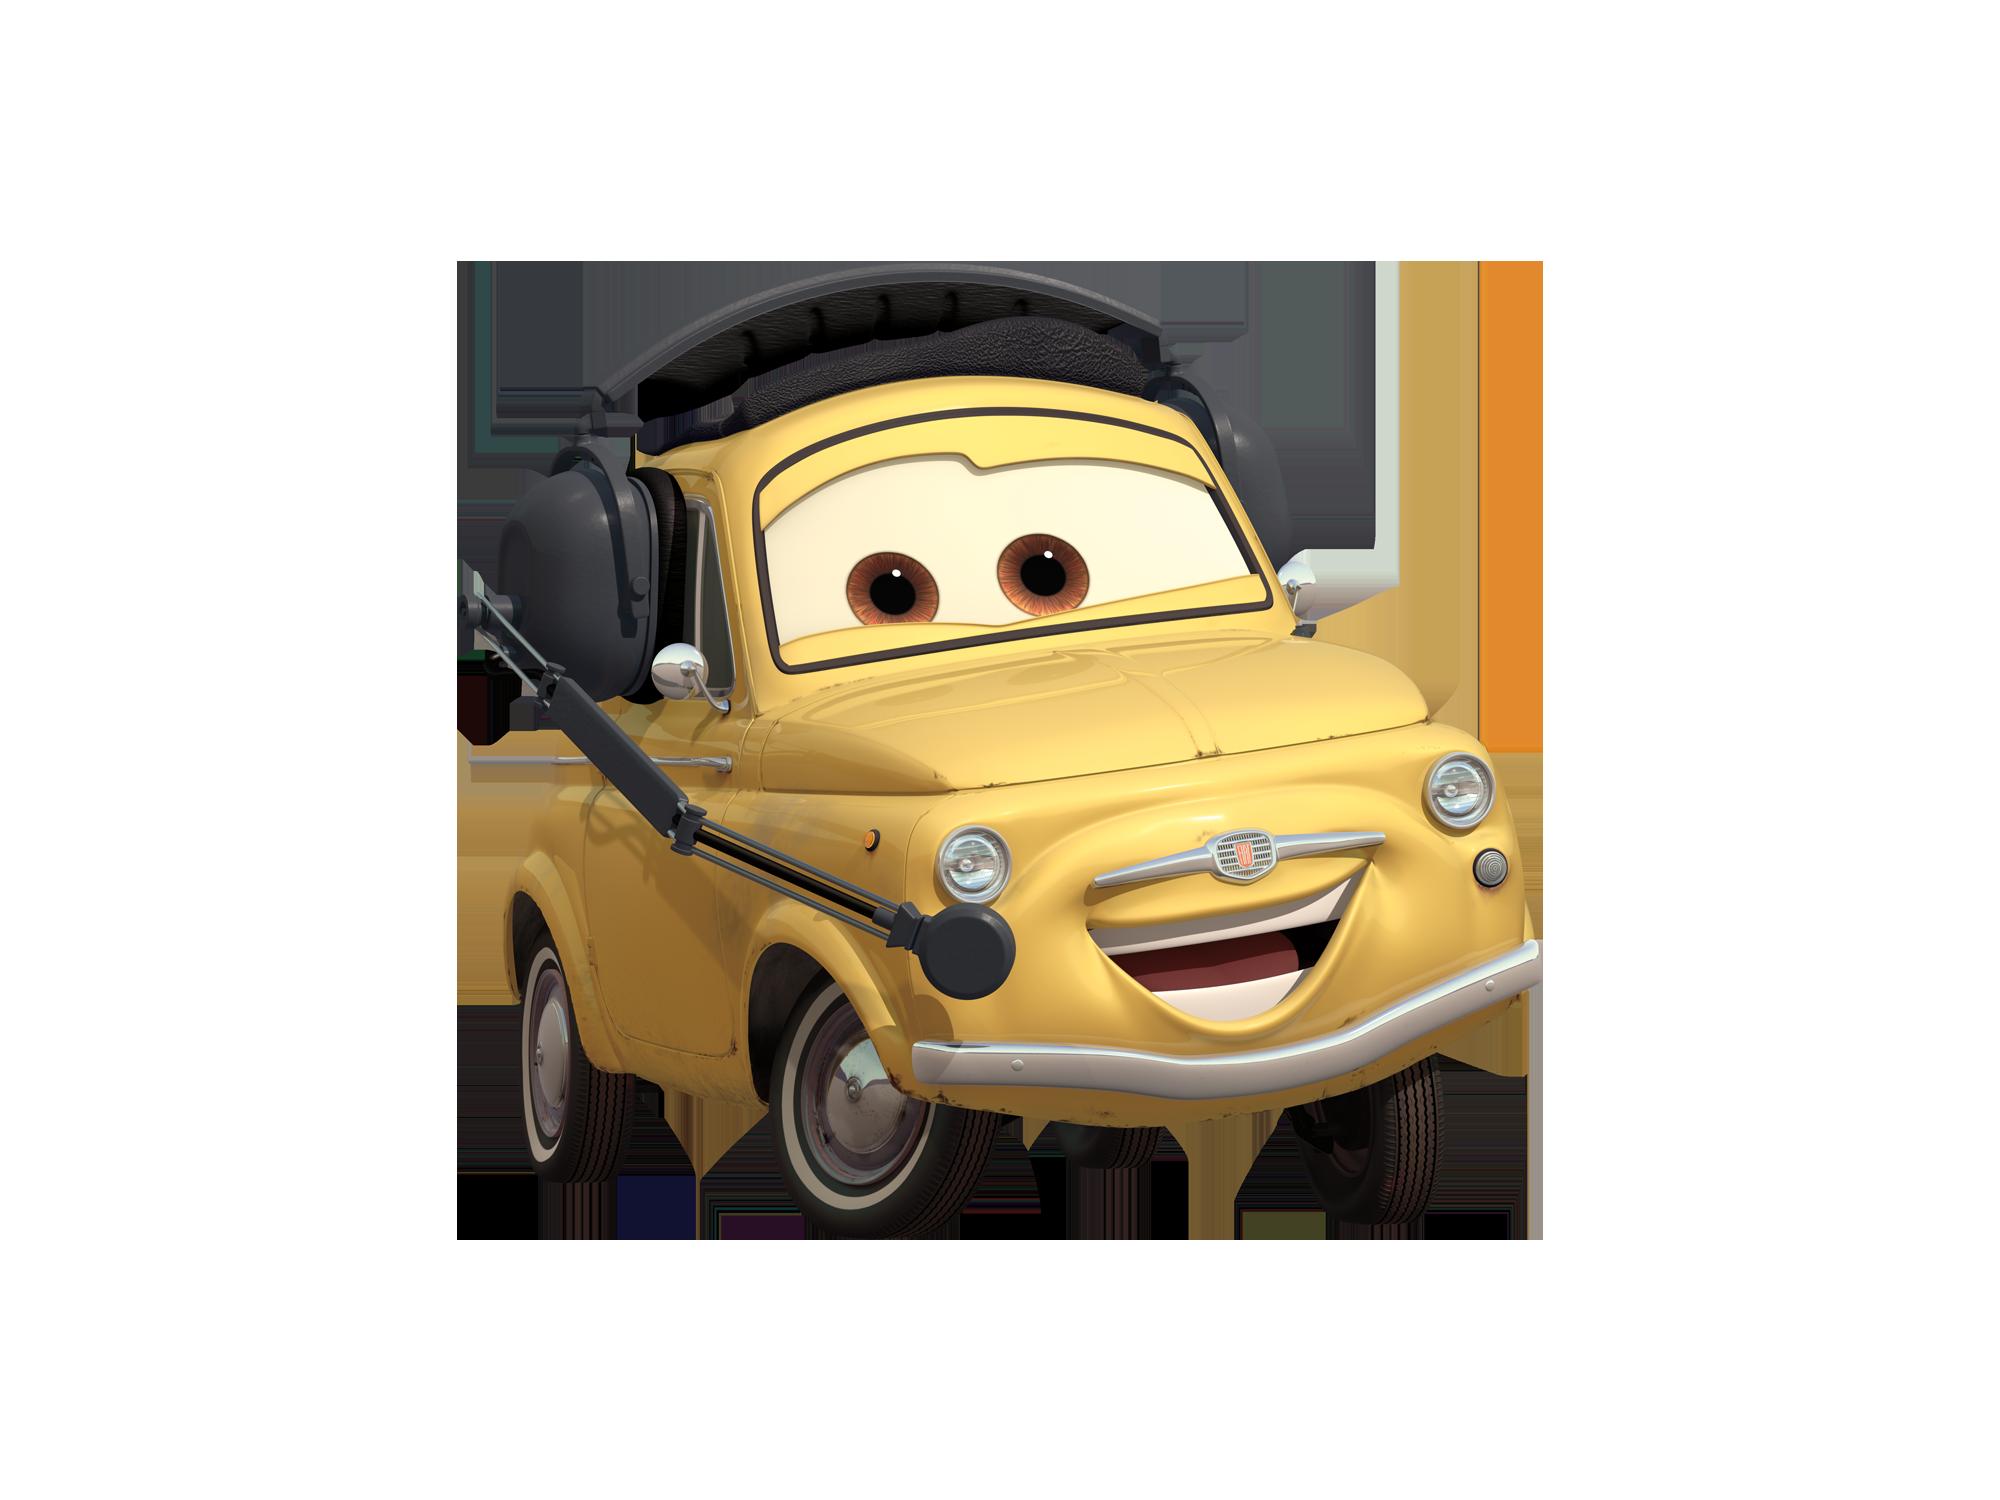 Cars 2 Cars Mater.